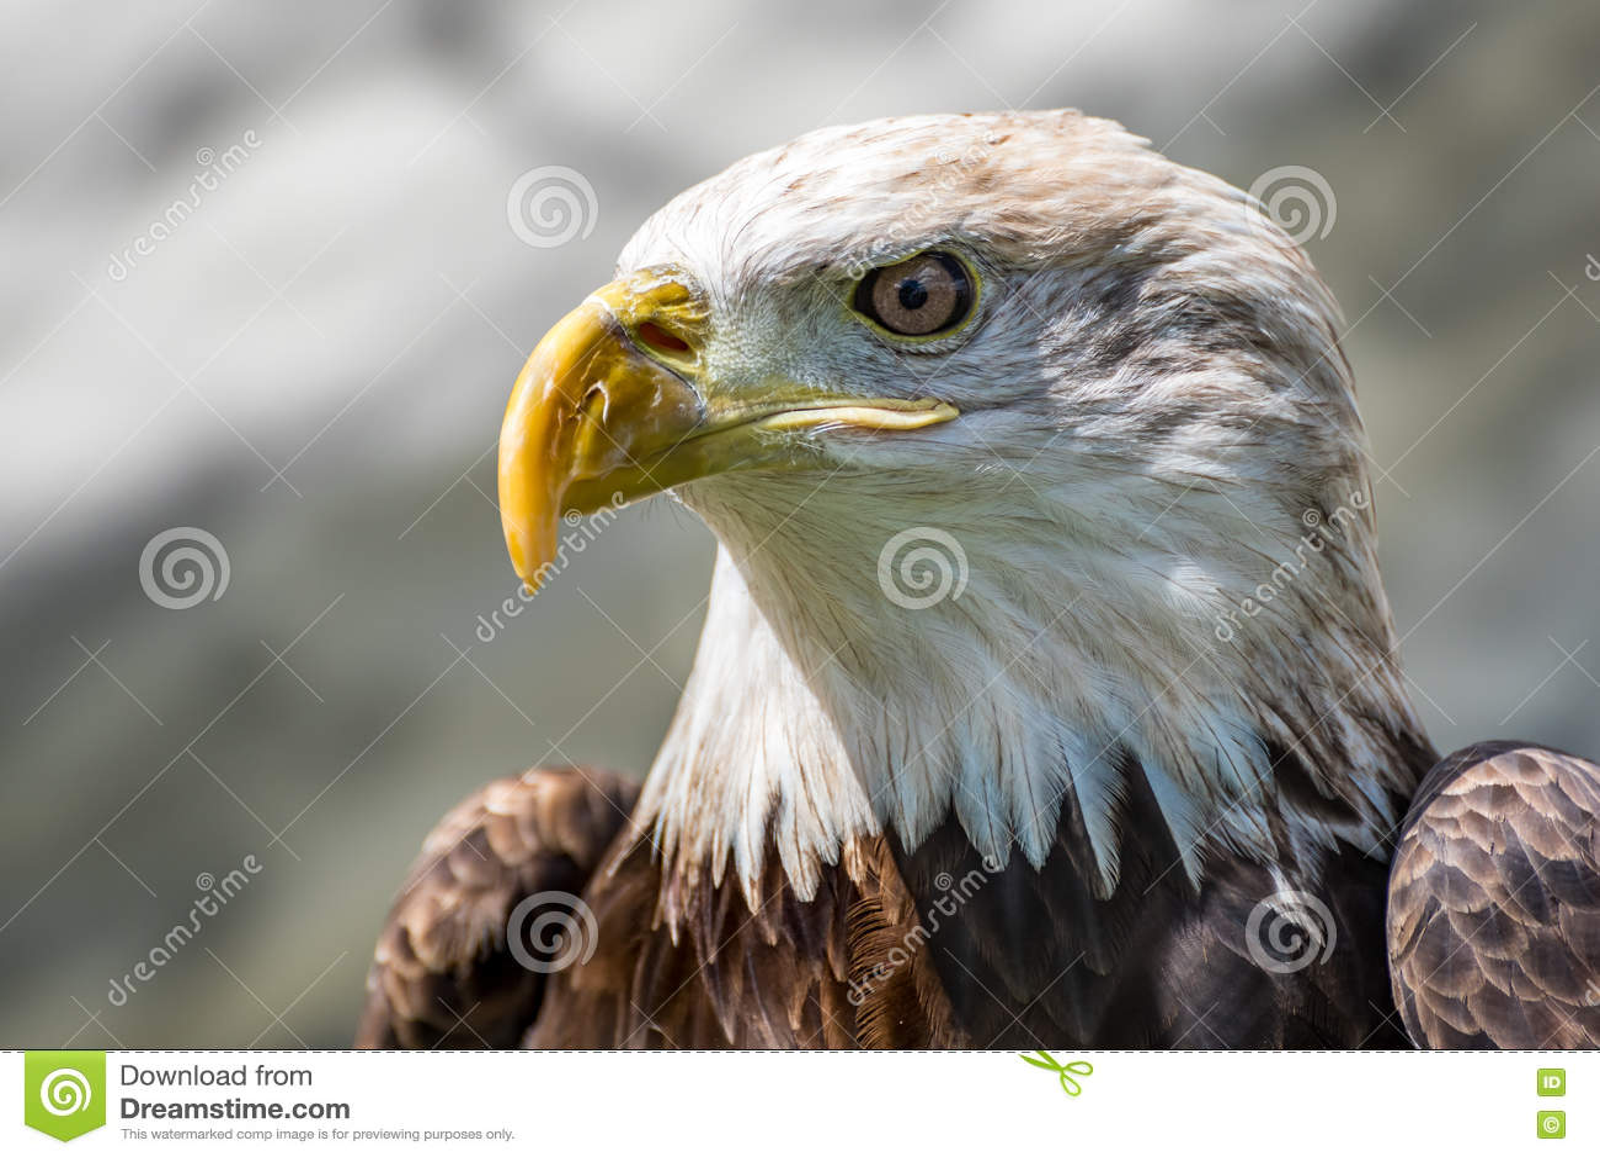 Closeup View of American Bald Eagle